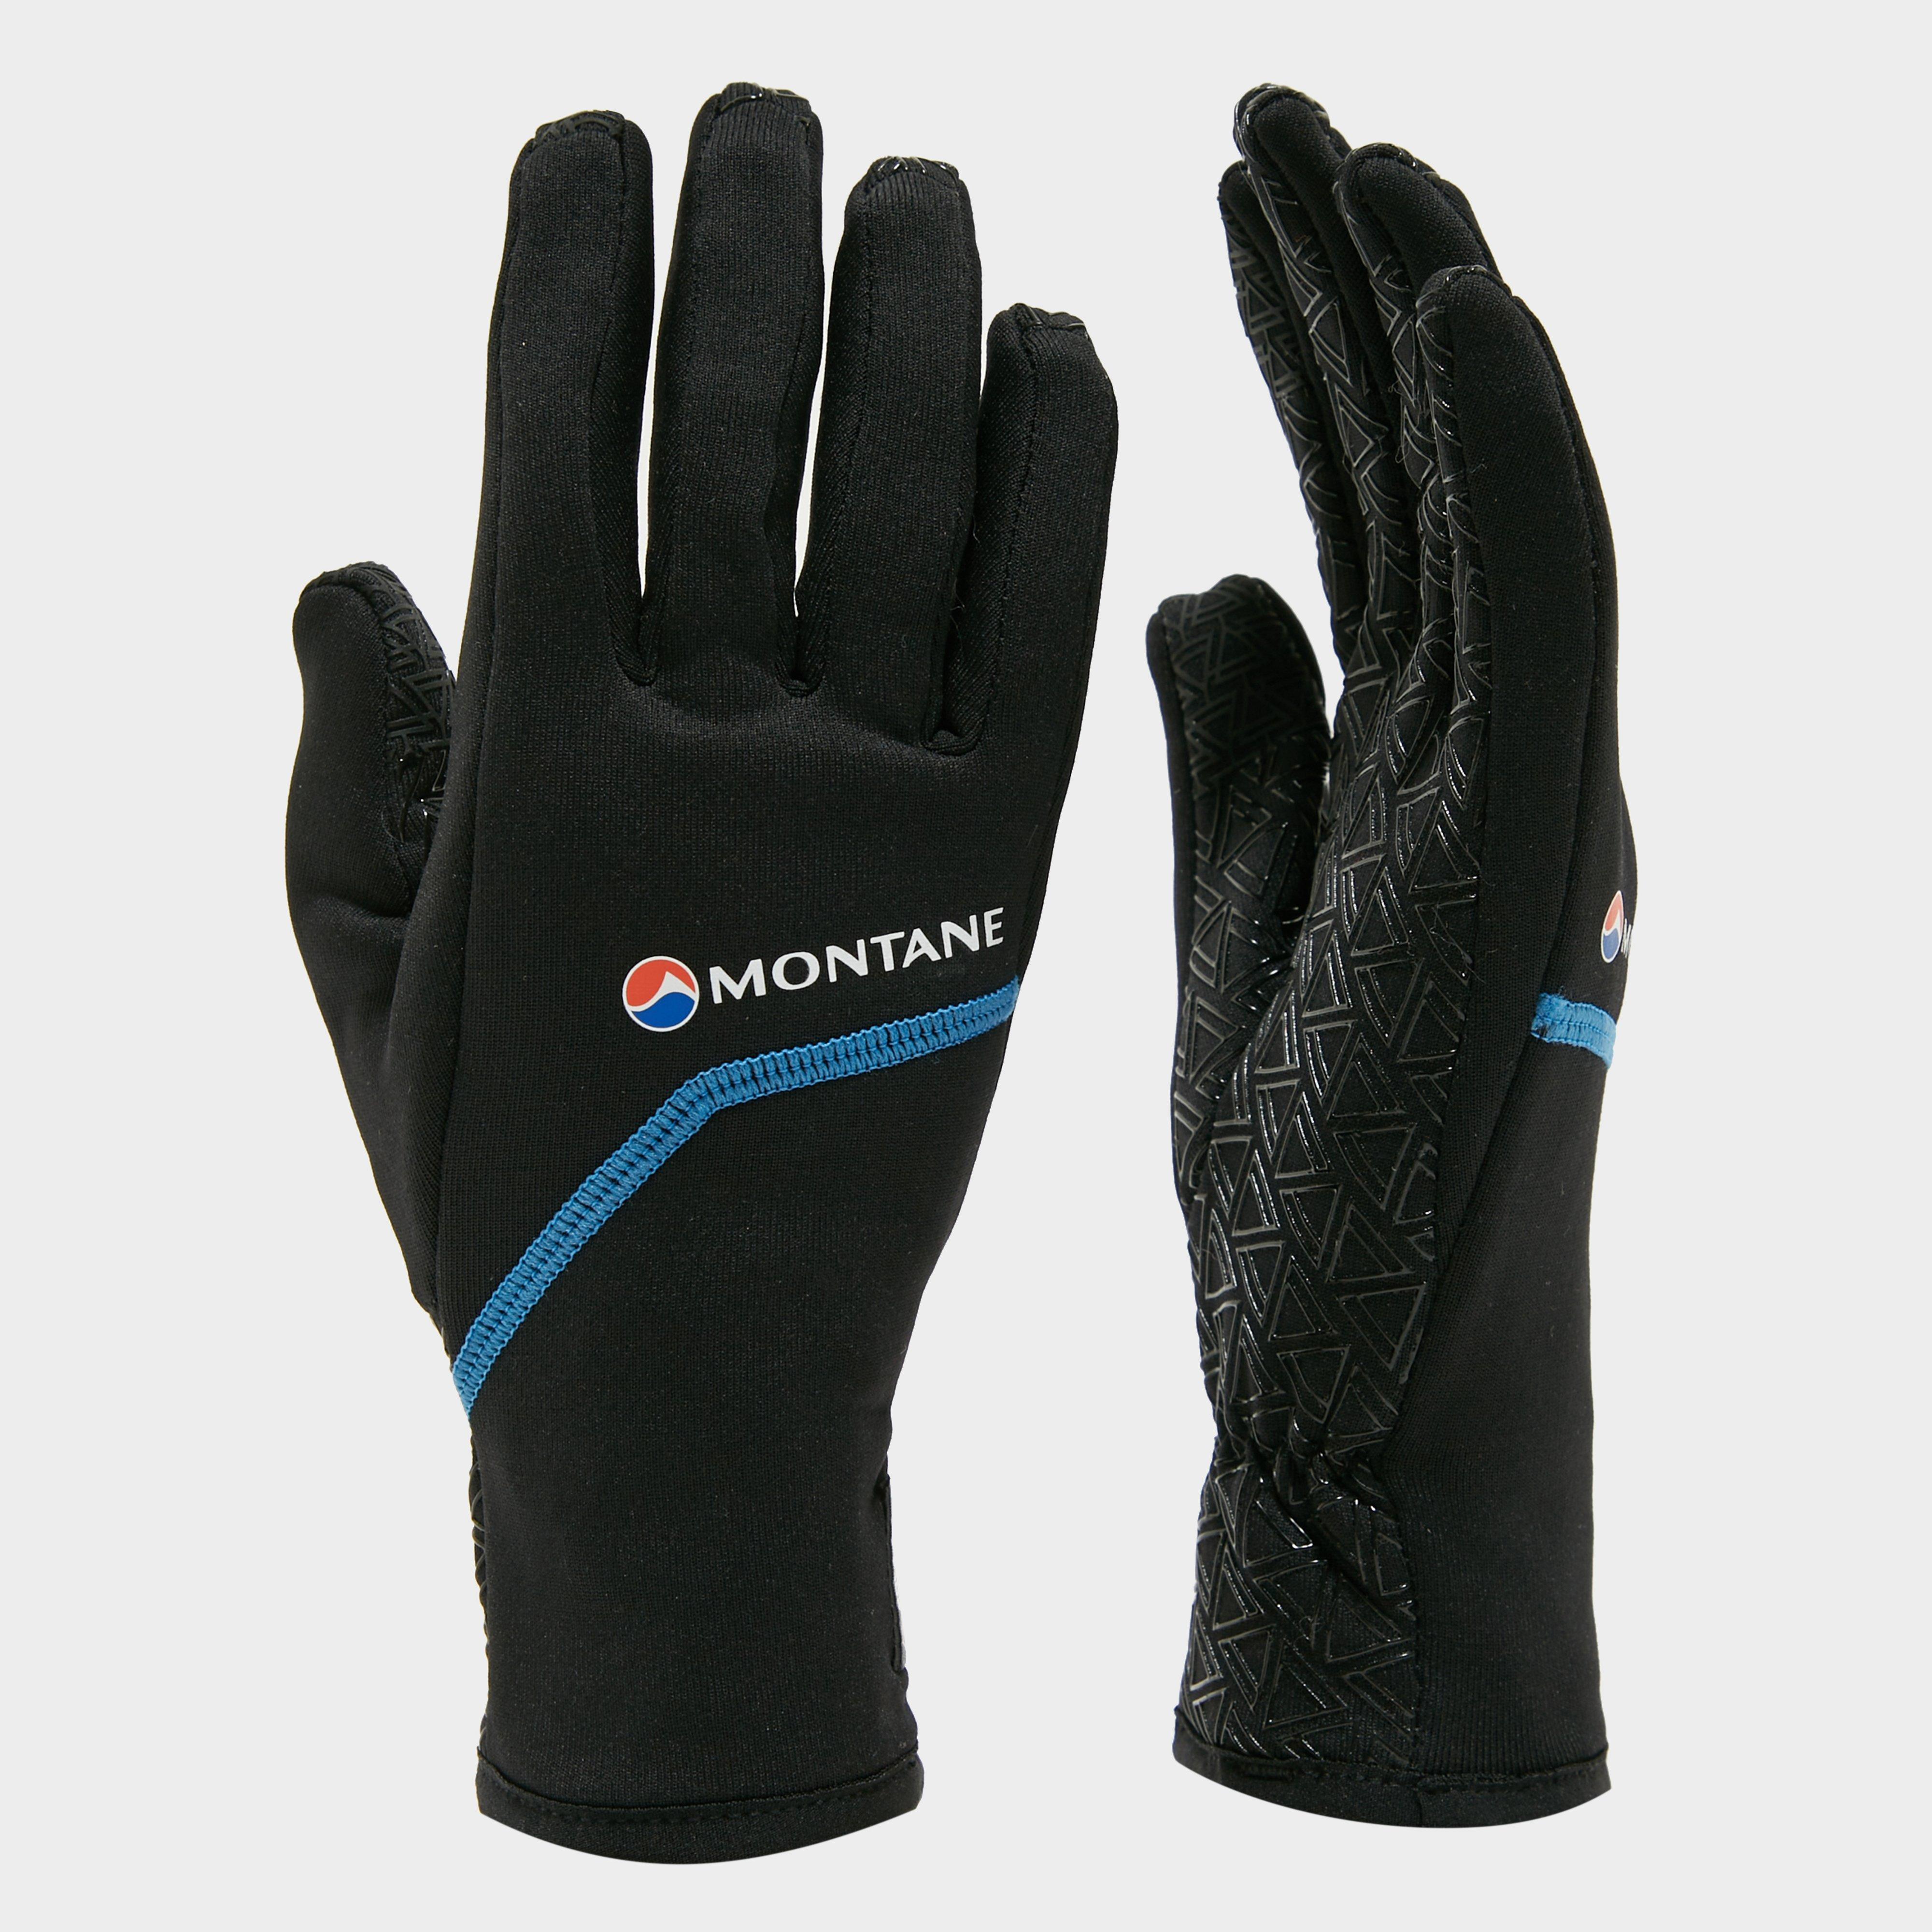 Montane Power Stretch Pro Grippy Gloves - Black/grippy  Black/grippy